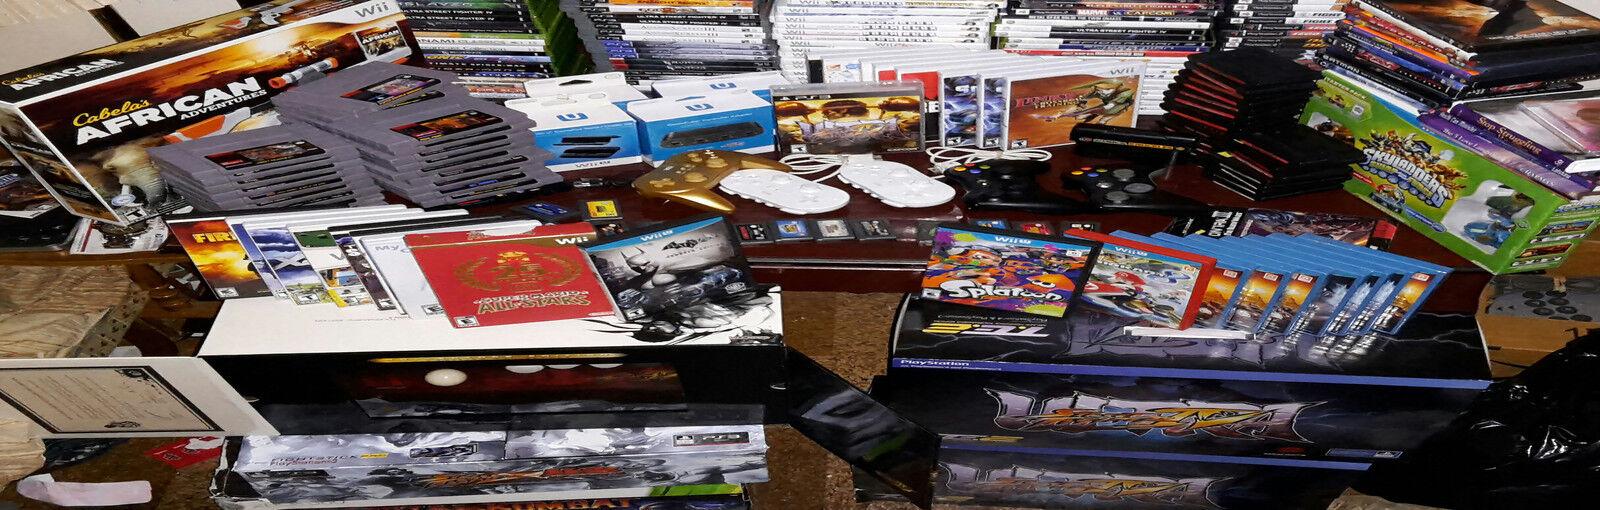 Ivbincald Goods and Games